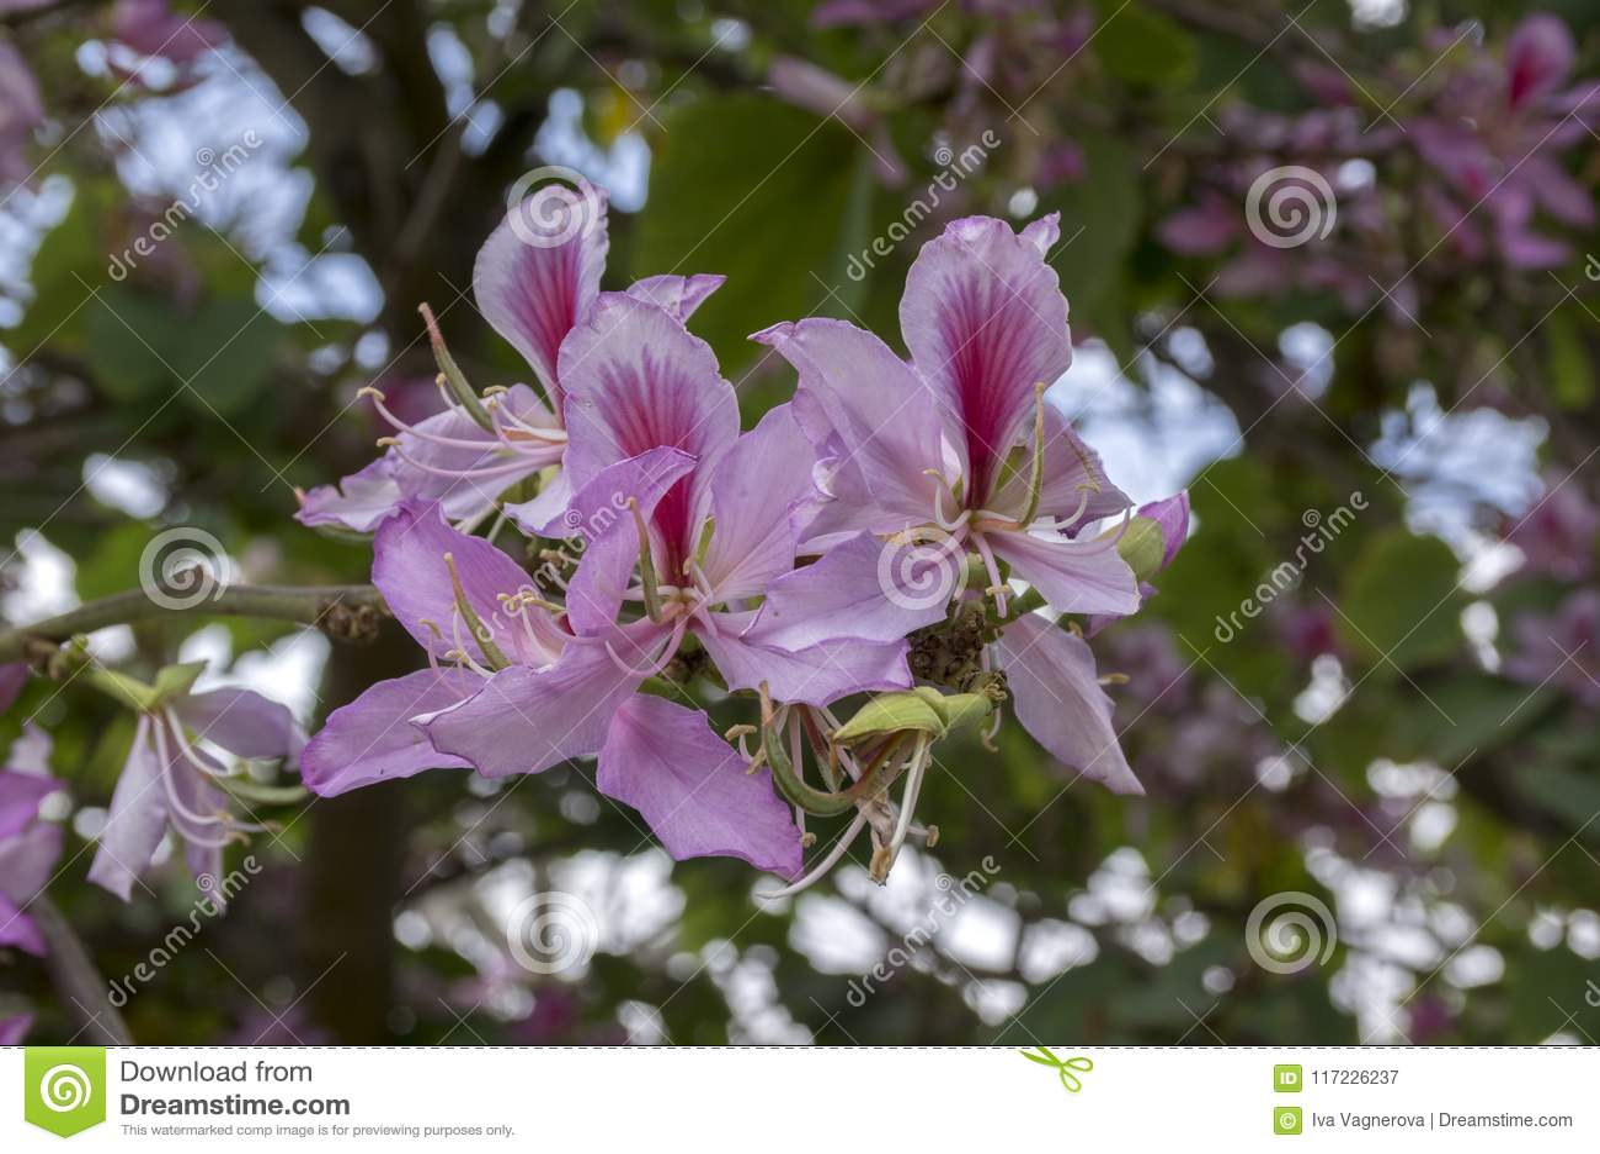 Bauhinia Purpurea Flowering Tropical Tree With Purple Pink Violet